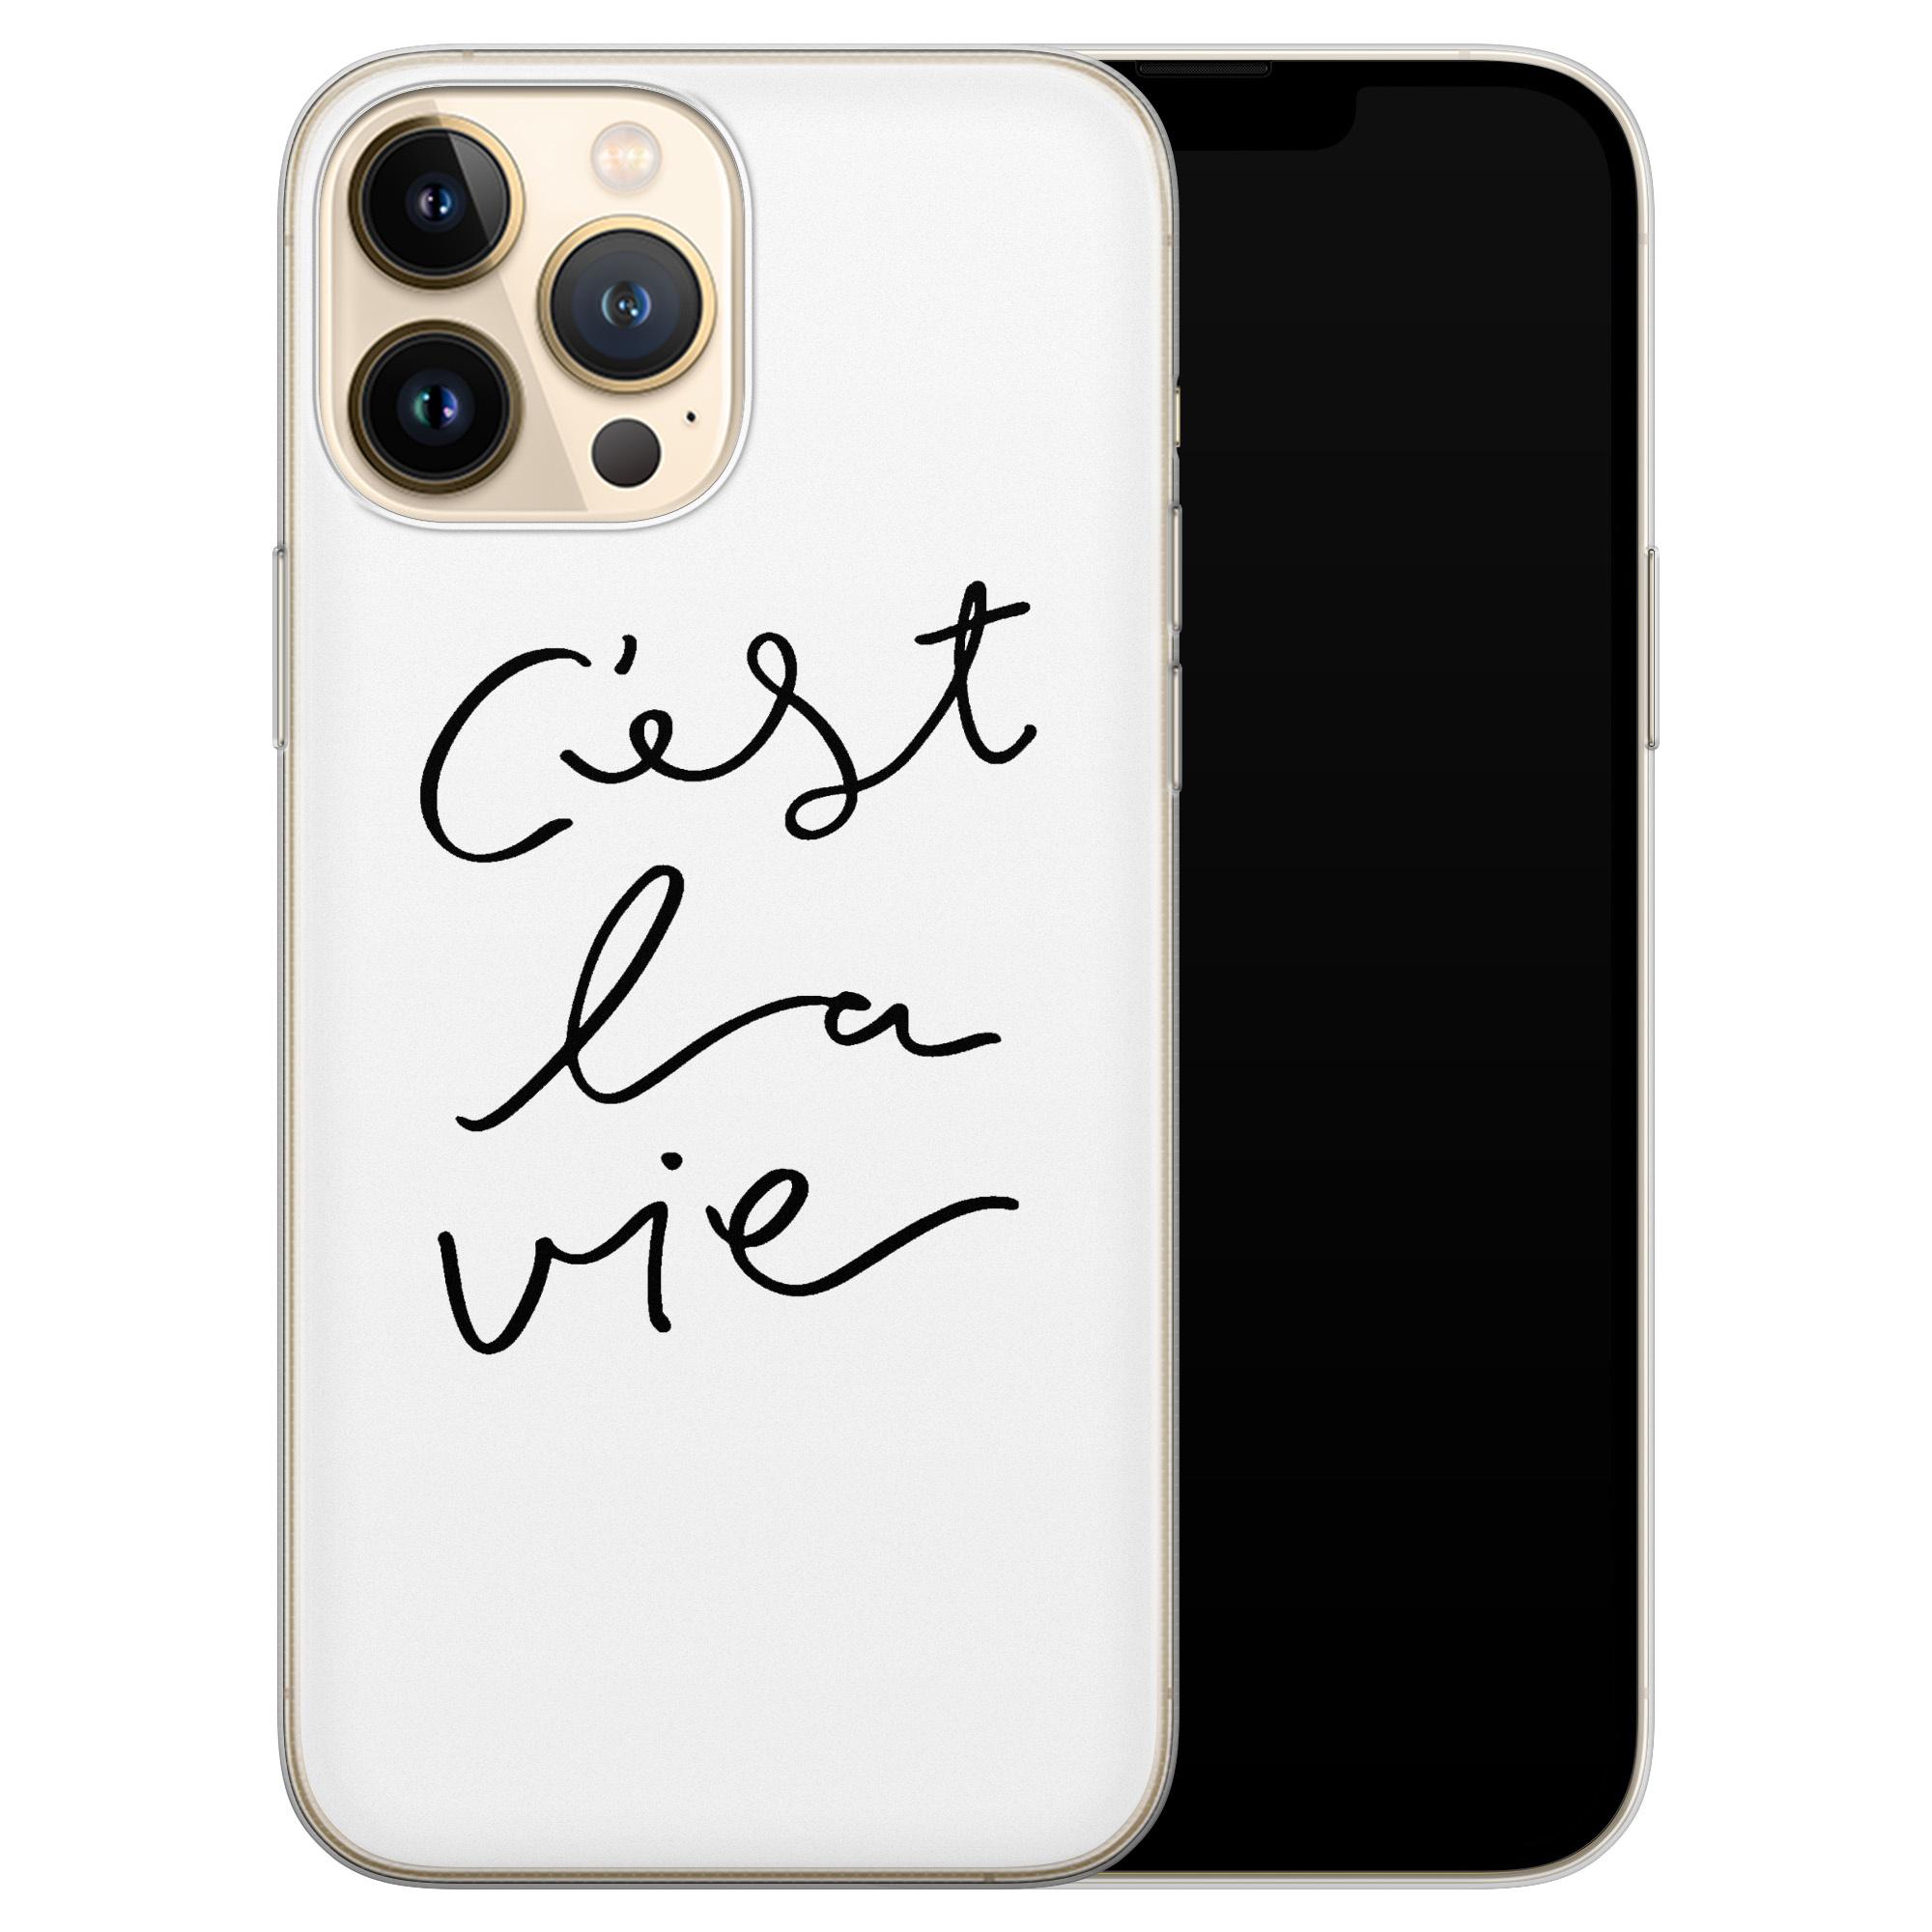 Leuke Telefoonhoesjes iPhone 13 Pro Max siliconen hoesje - C'est la vie